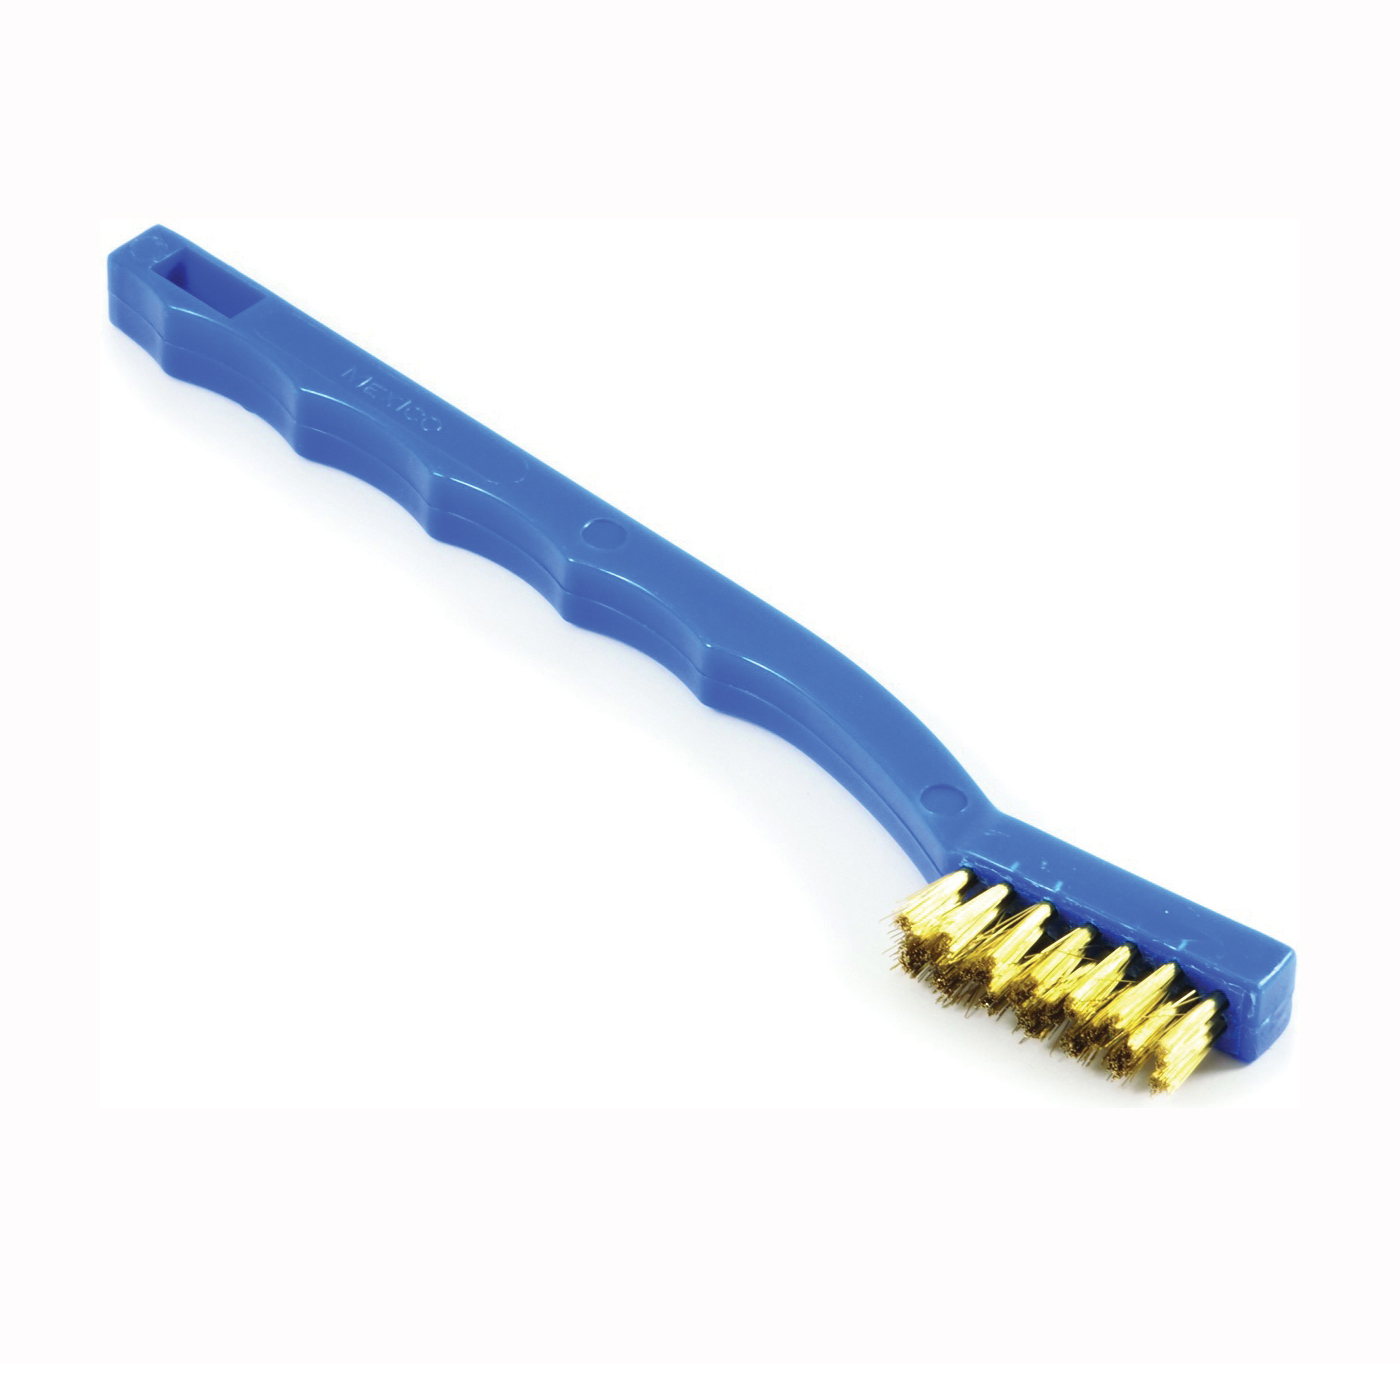 Picture of Forney 70489 Scratch Brush, 0.006 in L Trim, Brass Bristle